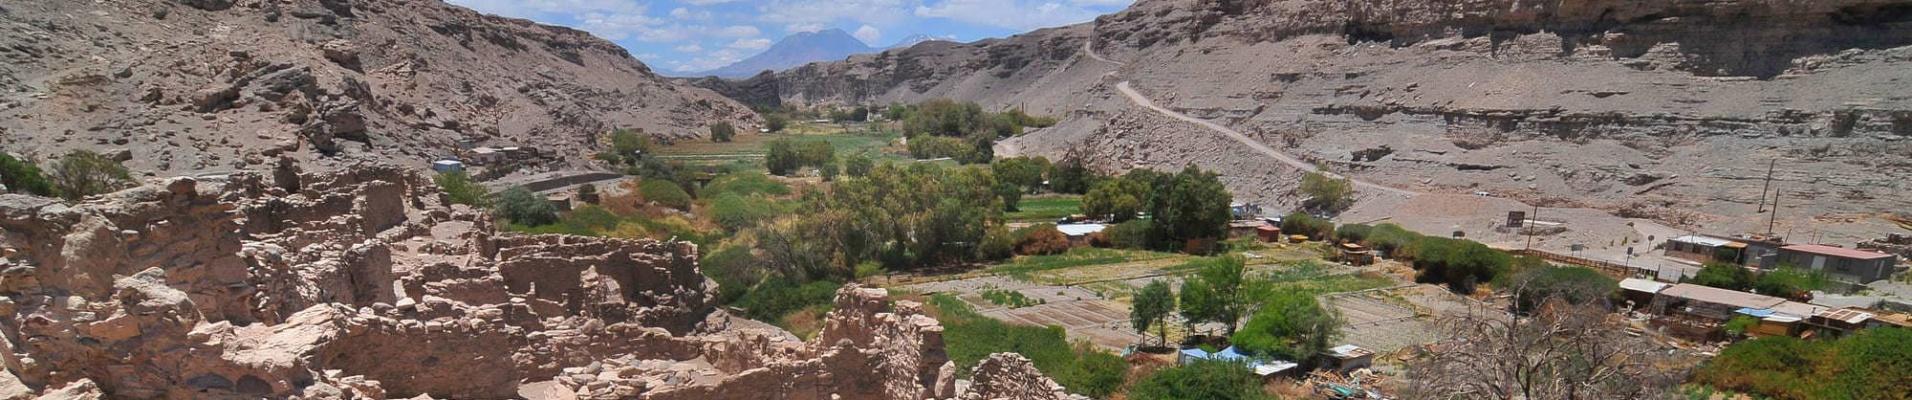 Paysage aride Chili Lasana